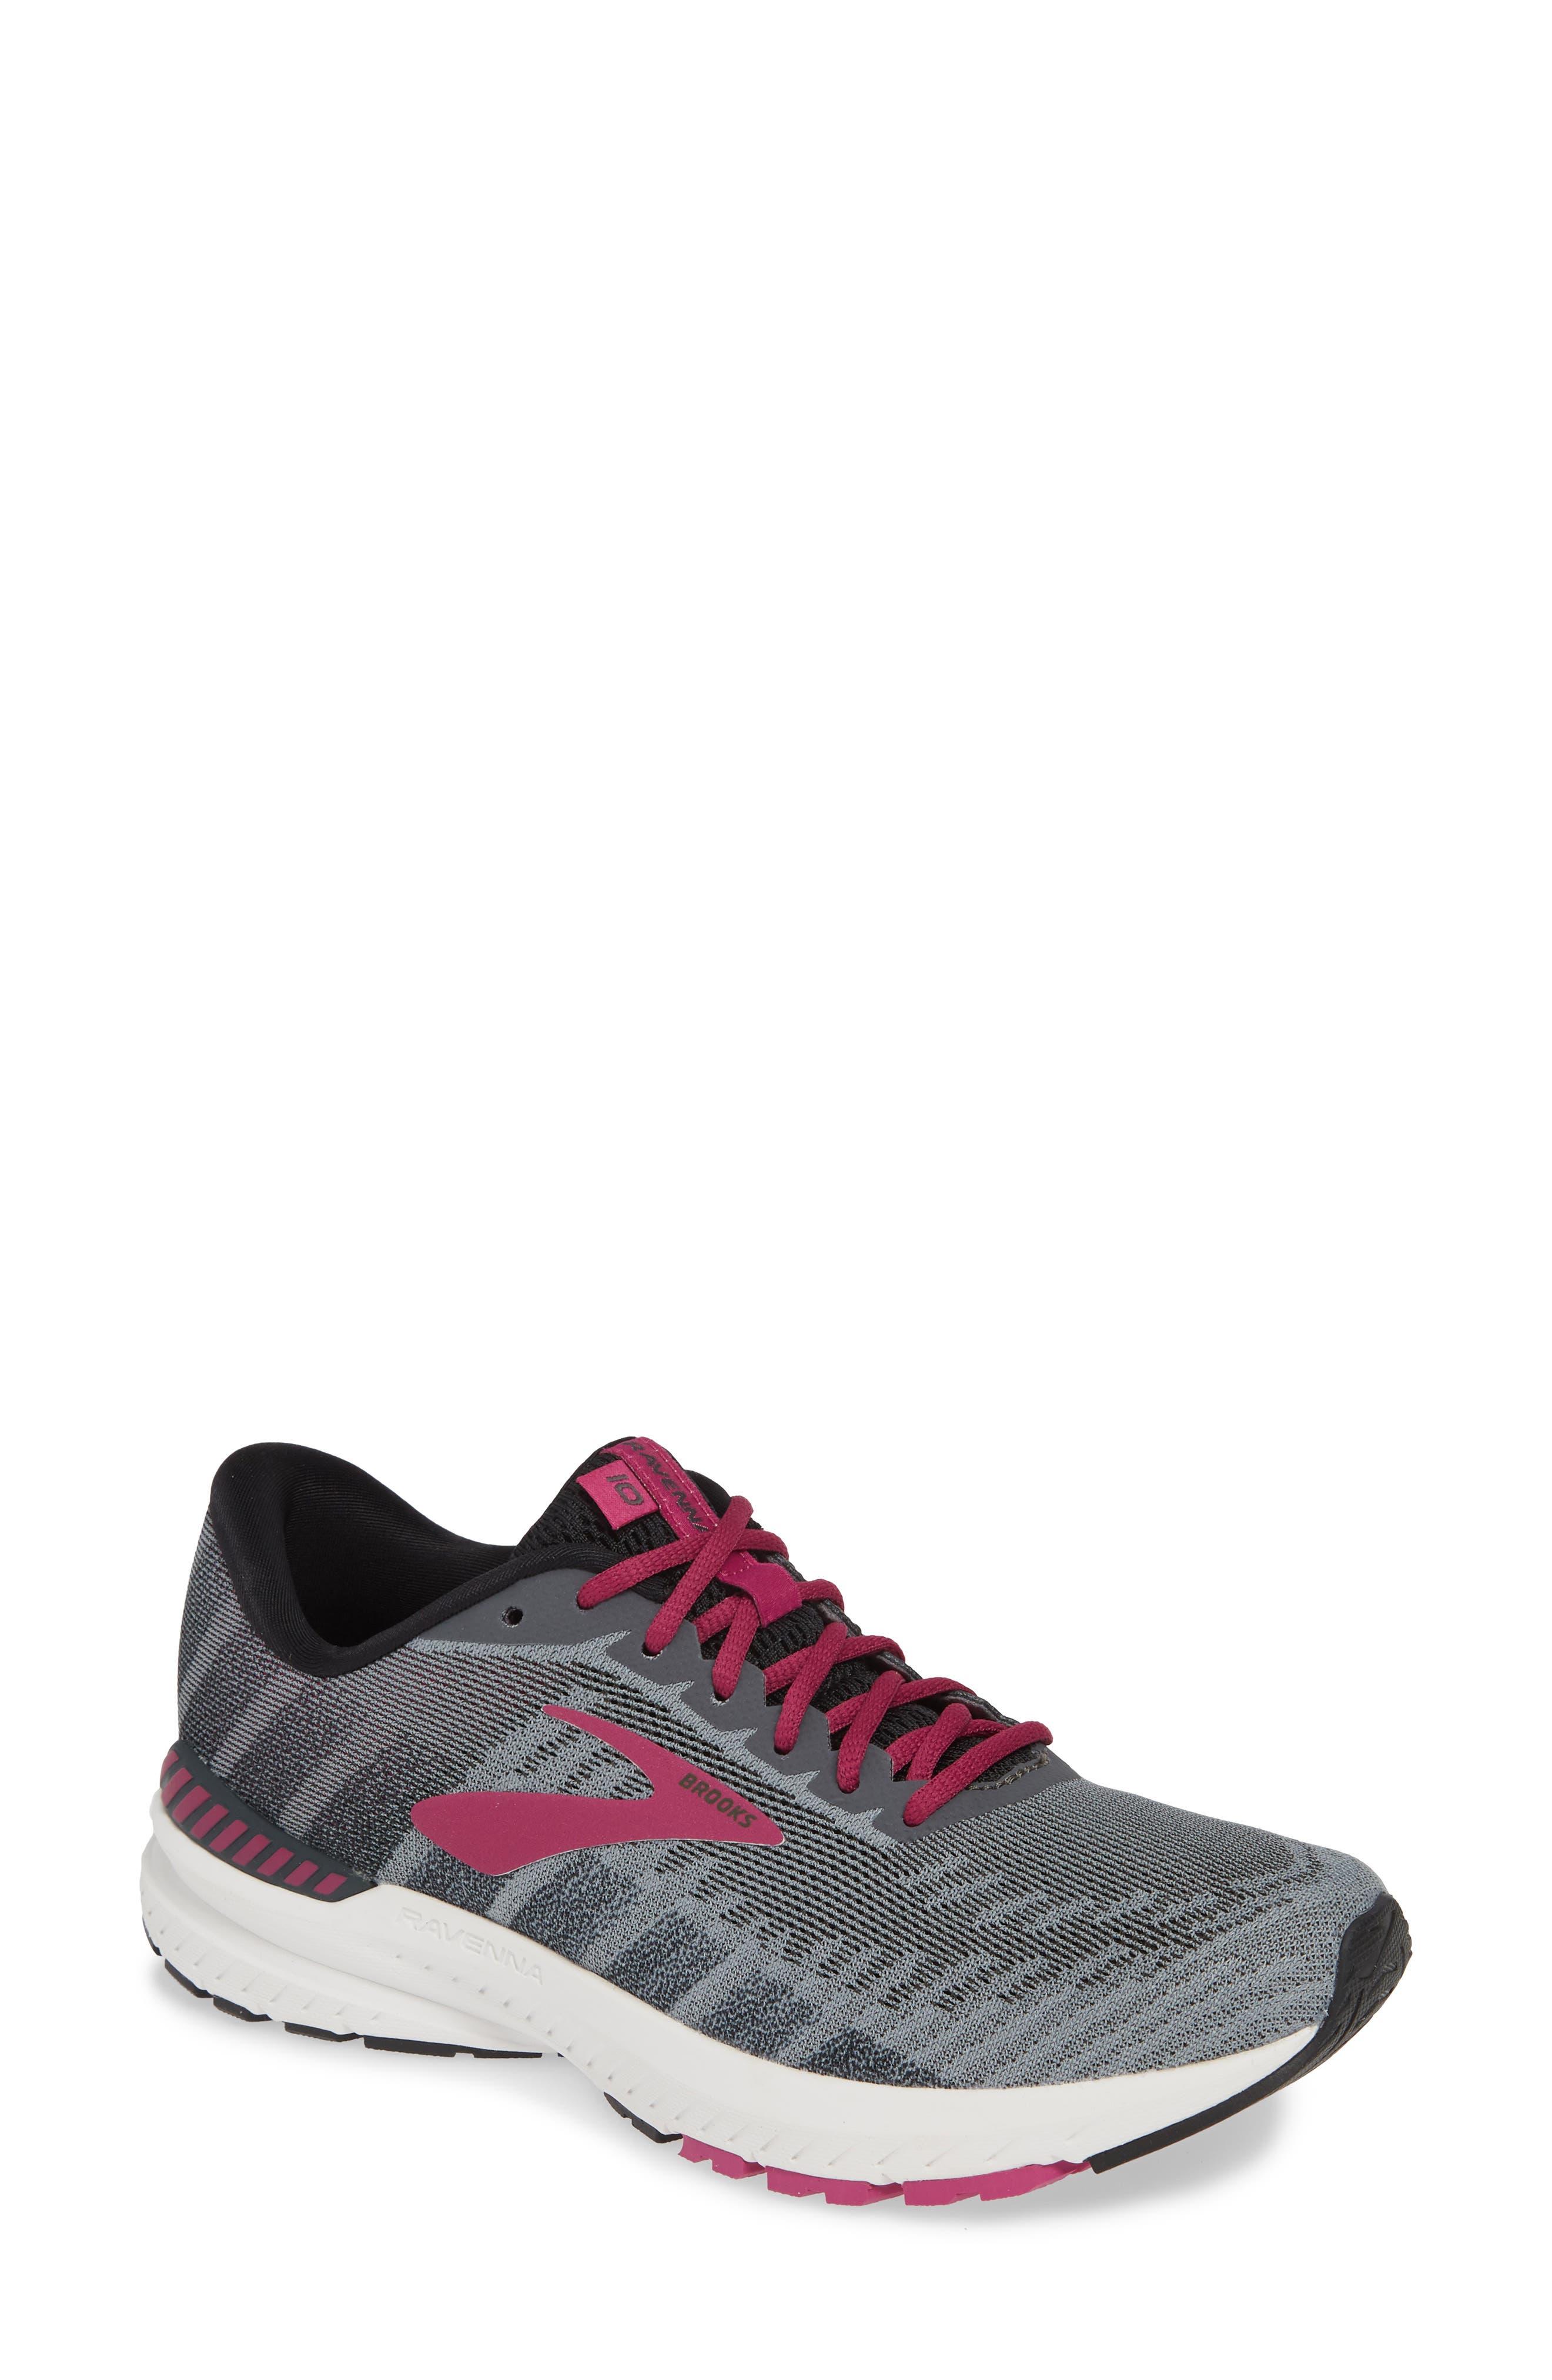 Brooks Ravenna 10 Running Shoe B - Grey